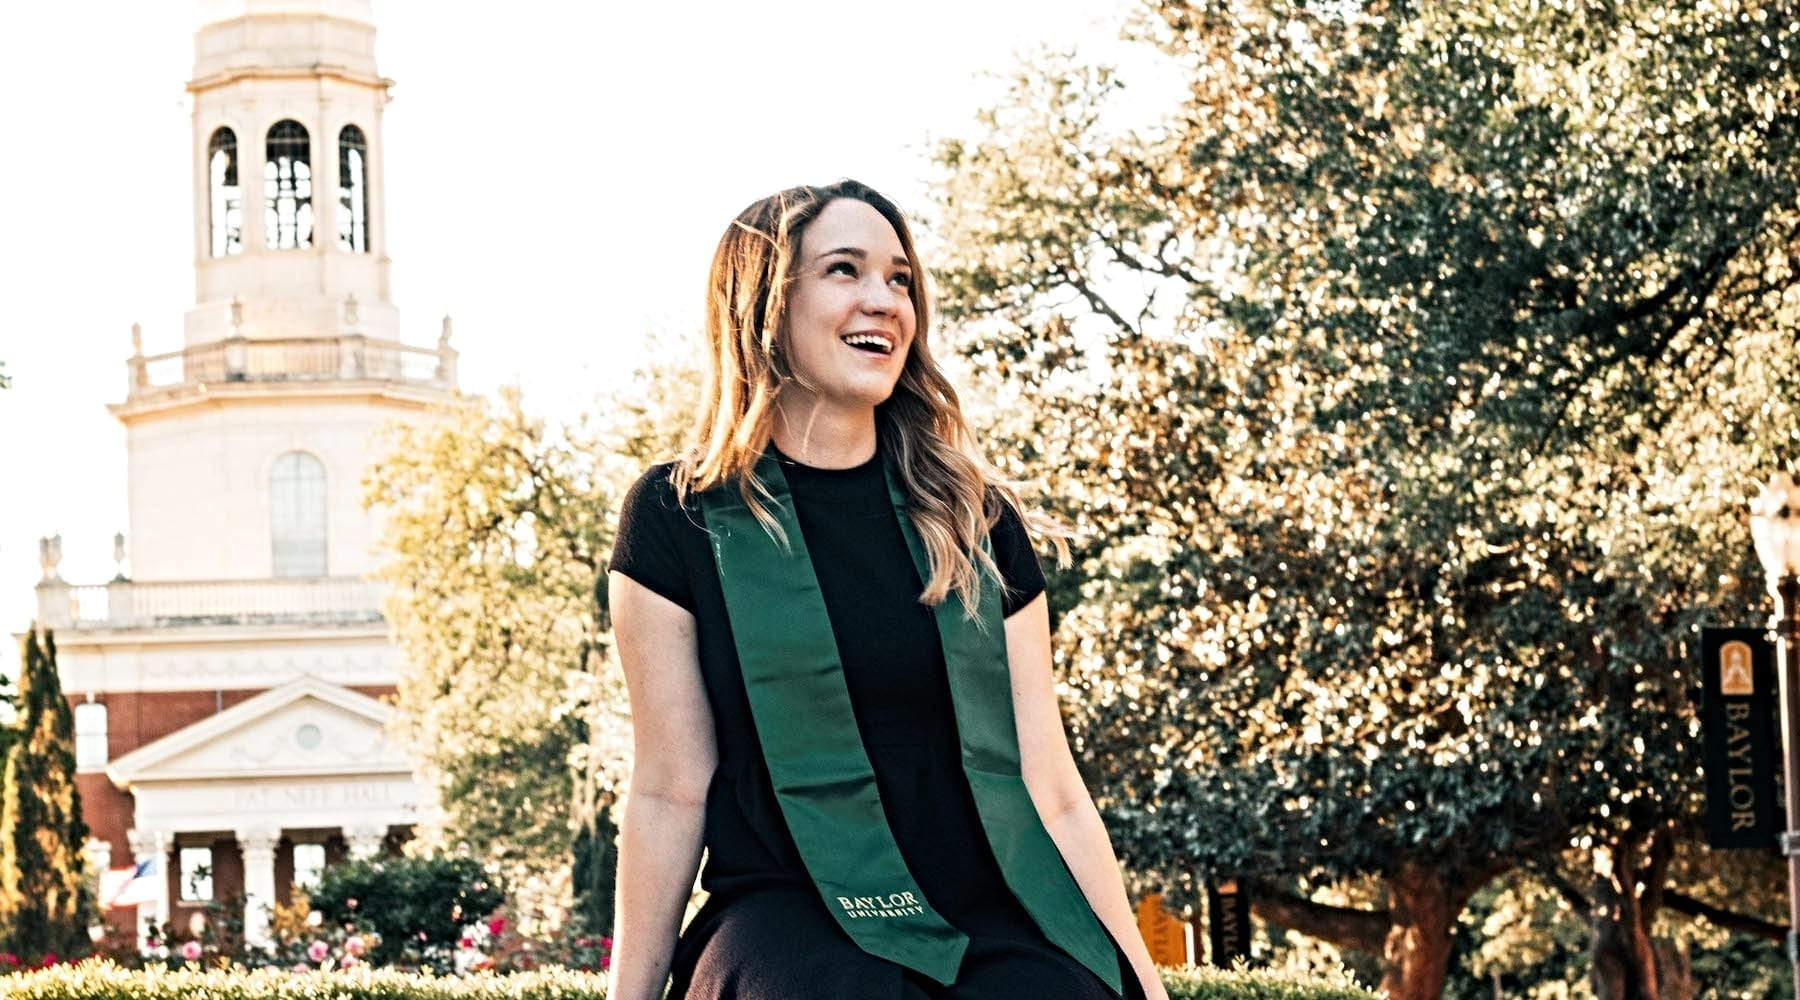 Paige Hardy on Baylor University's campus